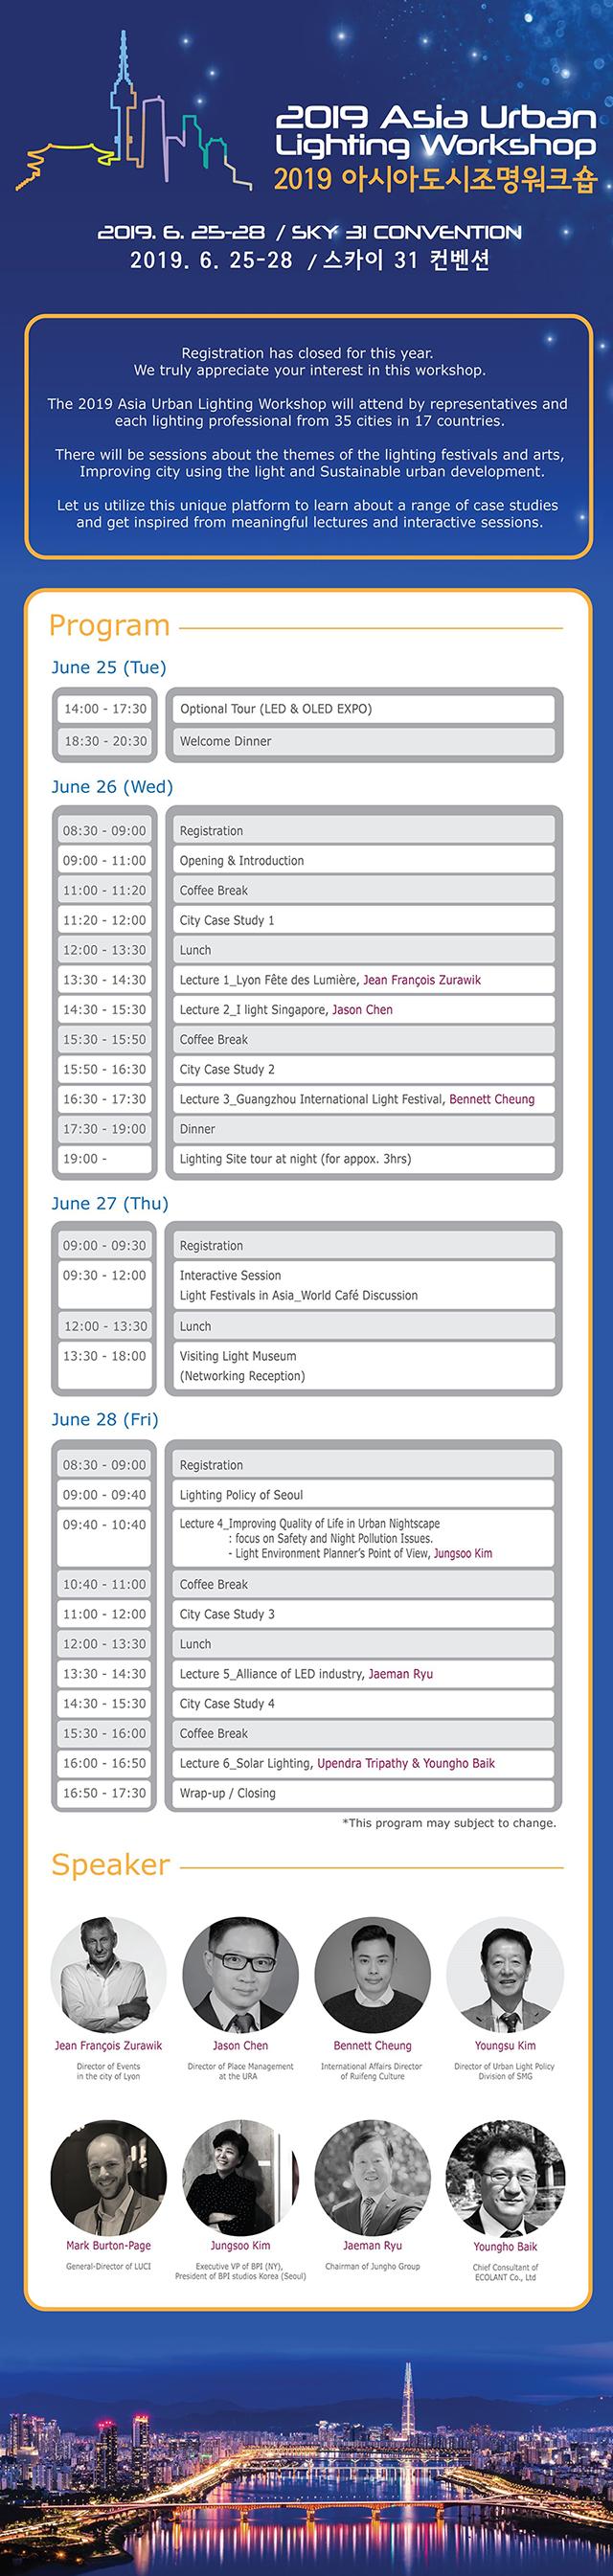 2019 Asia Urban Lighting Workshop 2019아시아도시조명워크숍 2019.6.25~28 / sky 31 Convention , 2019.6.25-28 / 스카이 31 컨벤션 www.asiaurbanlightingworkshop.org